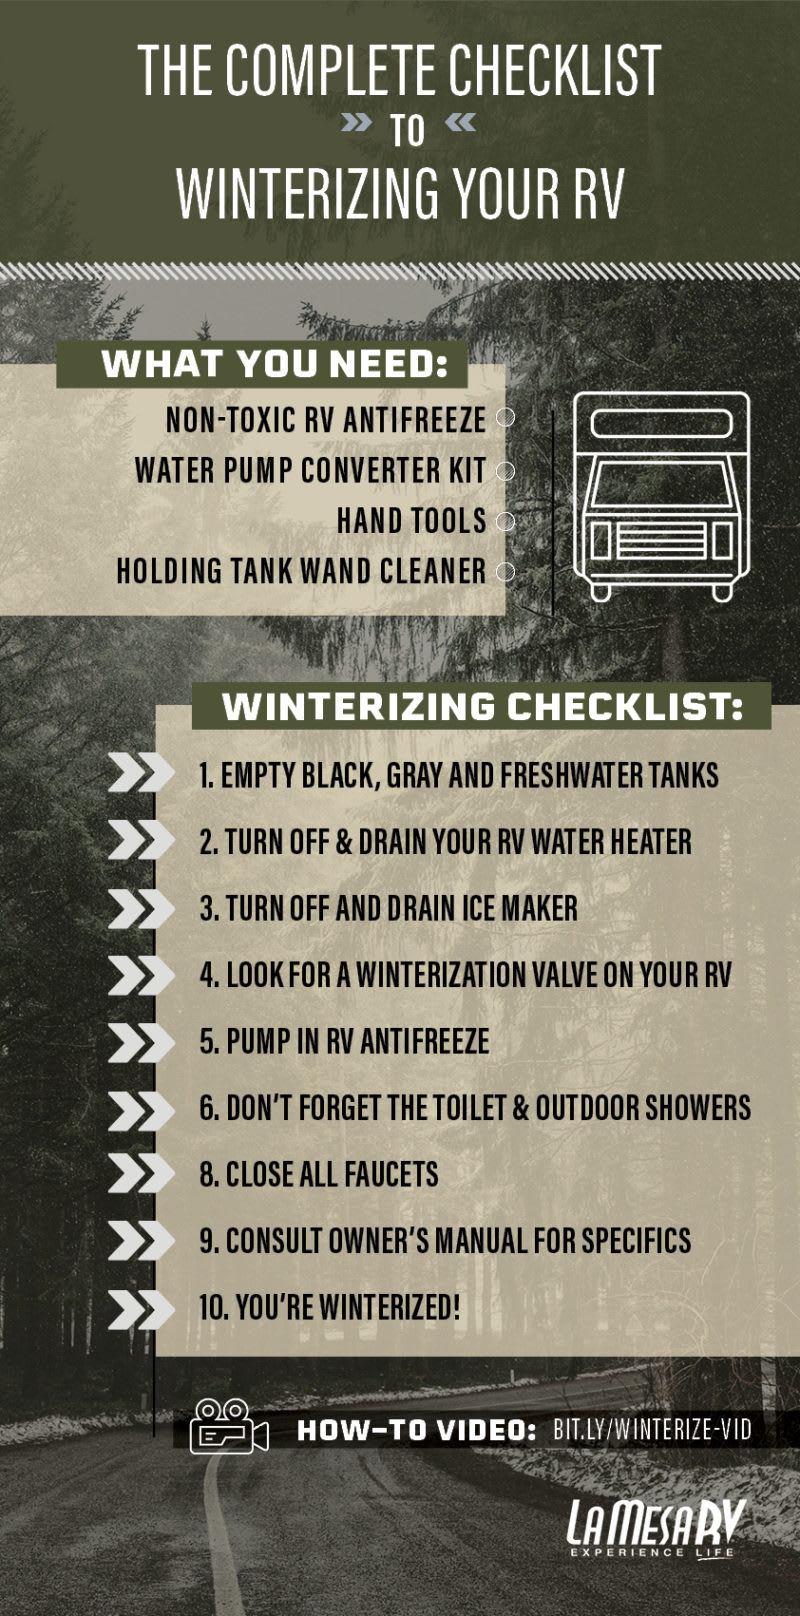 checklist for winterizing your RV